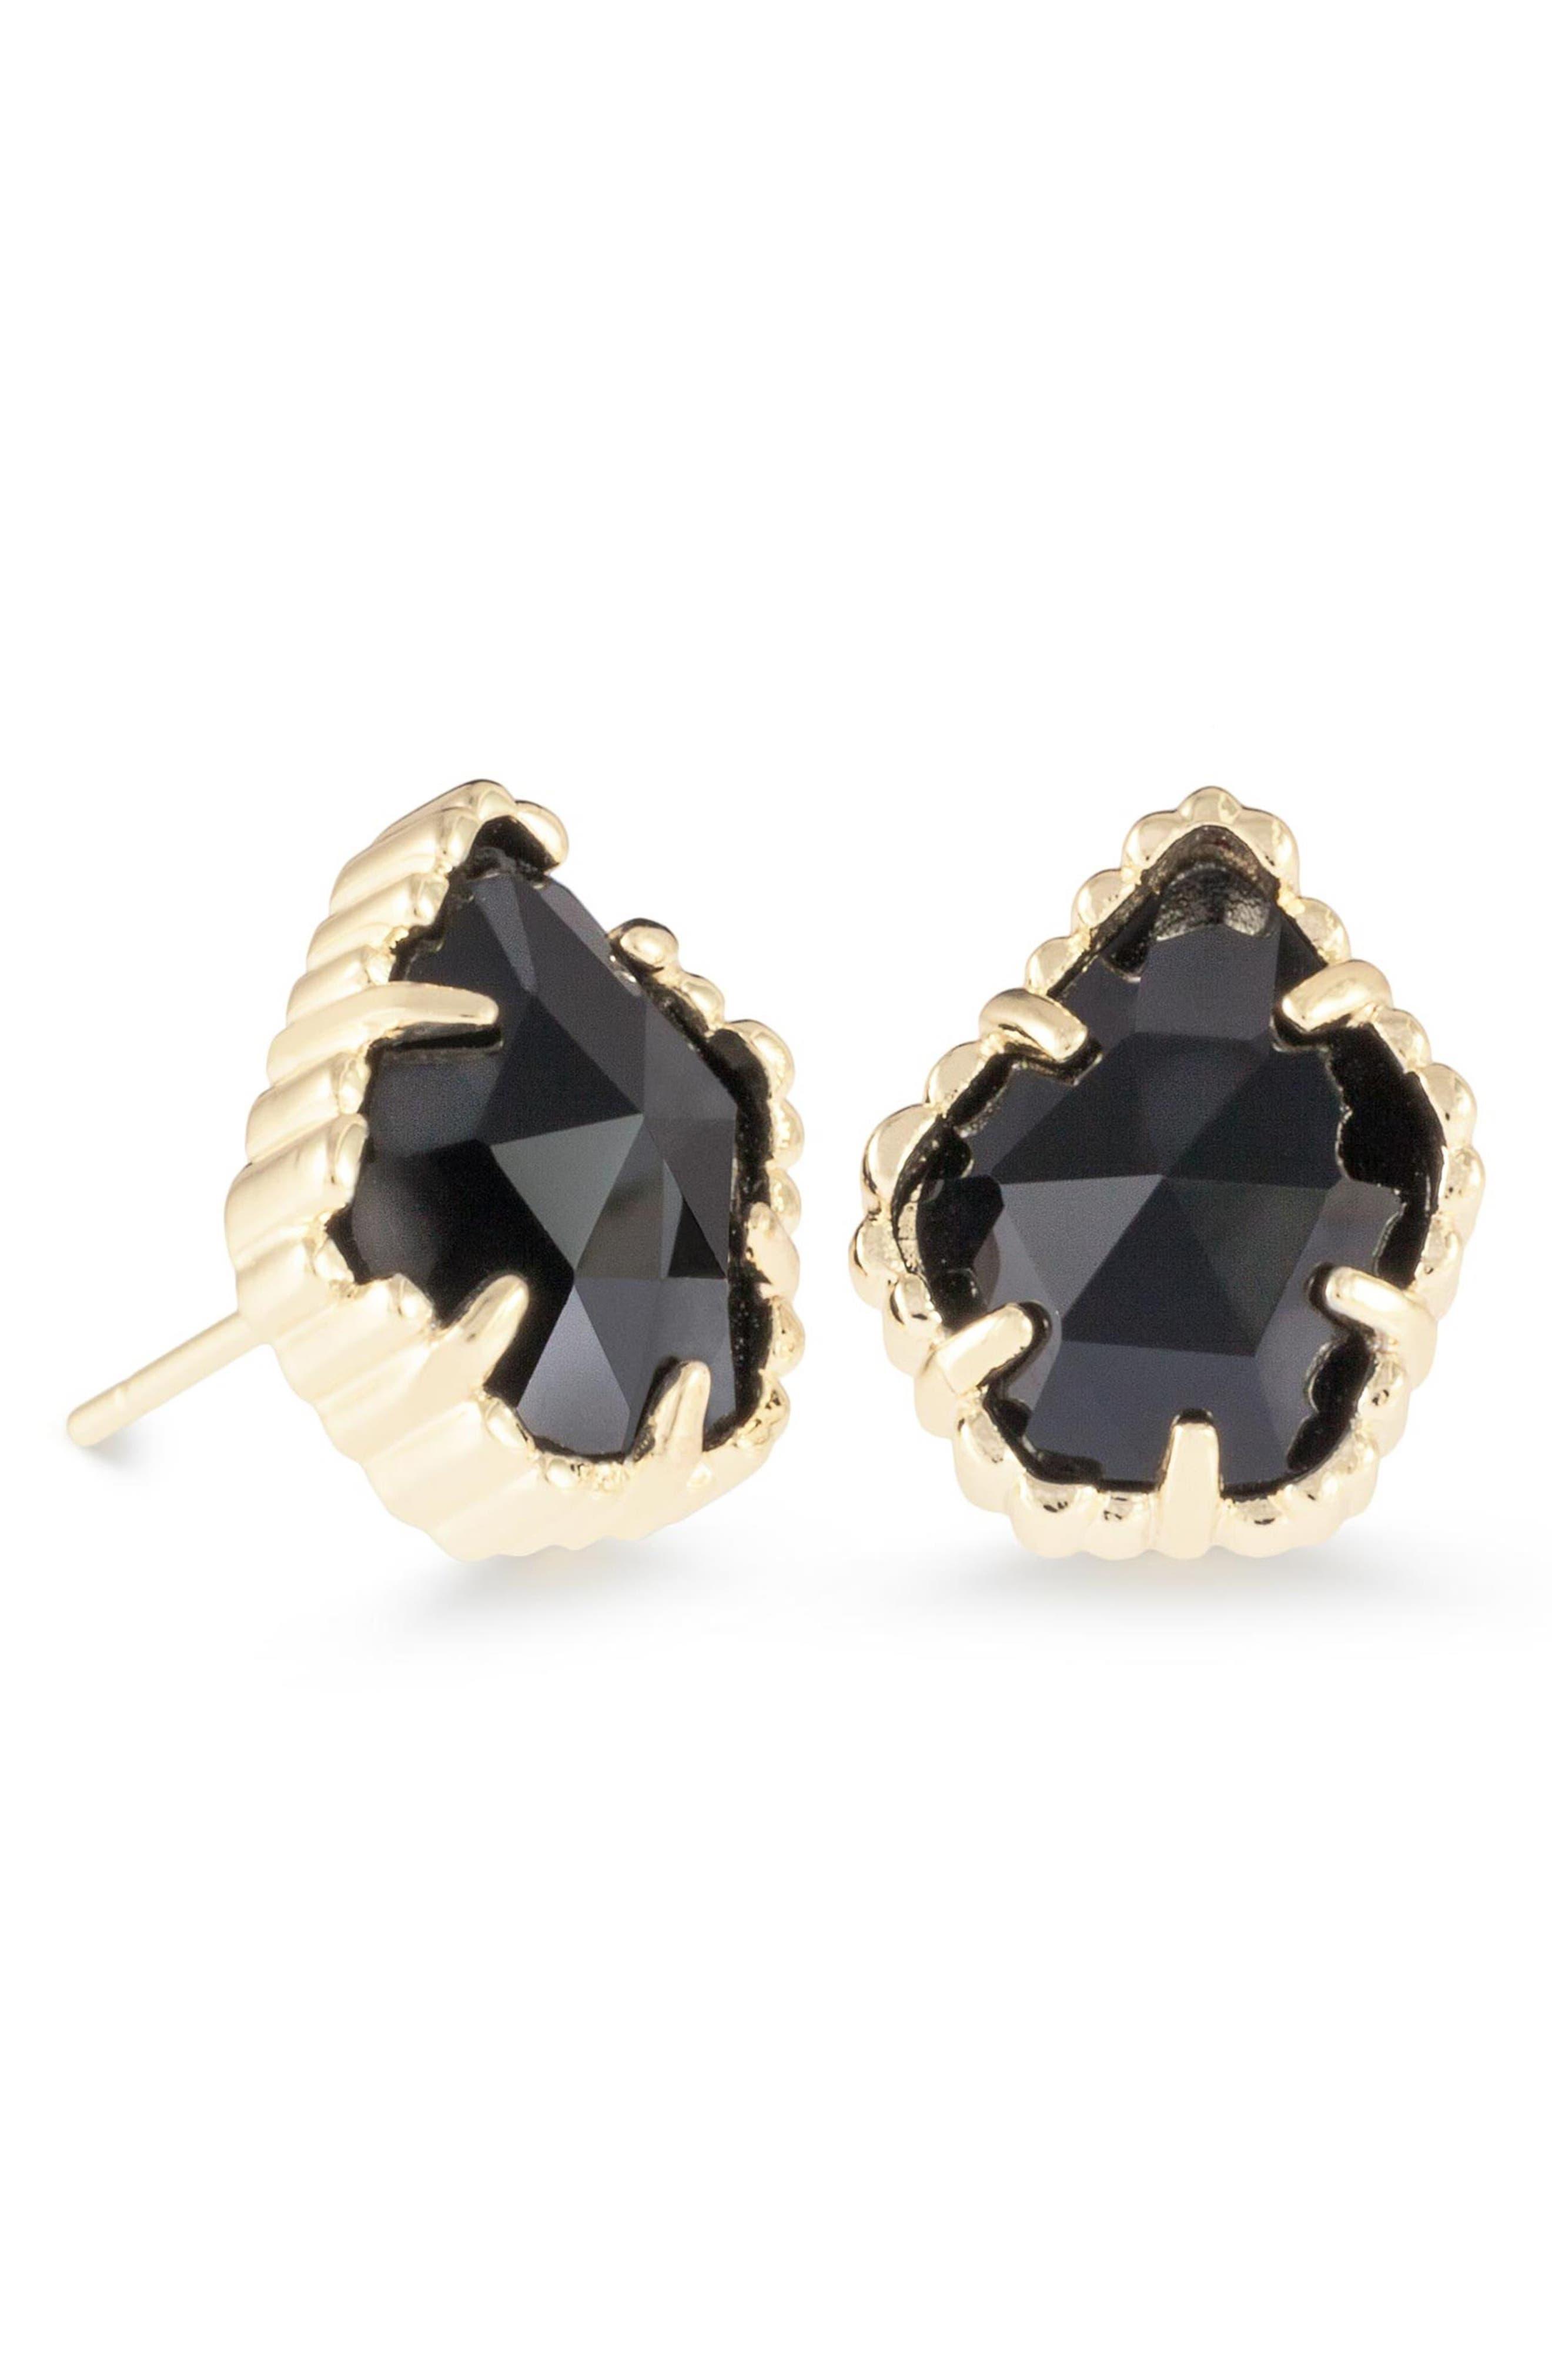 KENDRA SCOTT Tessa Stone Stud Earrings, Main, color, BLACK/ GOLD